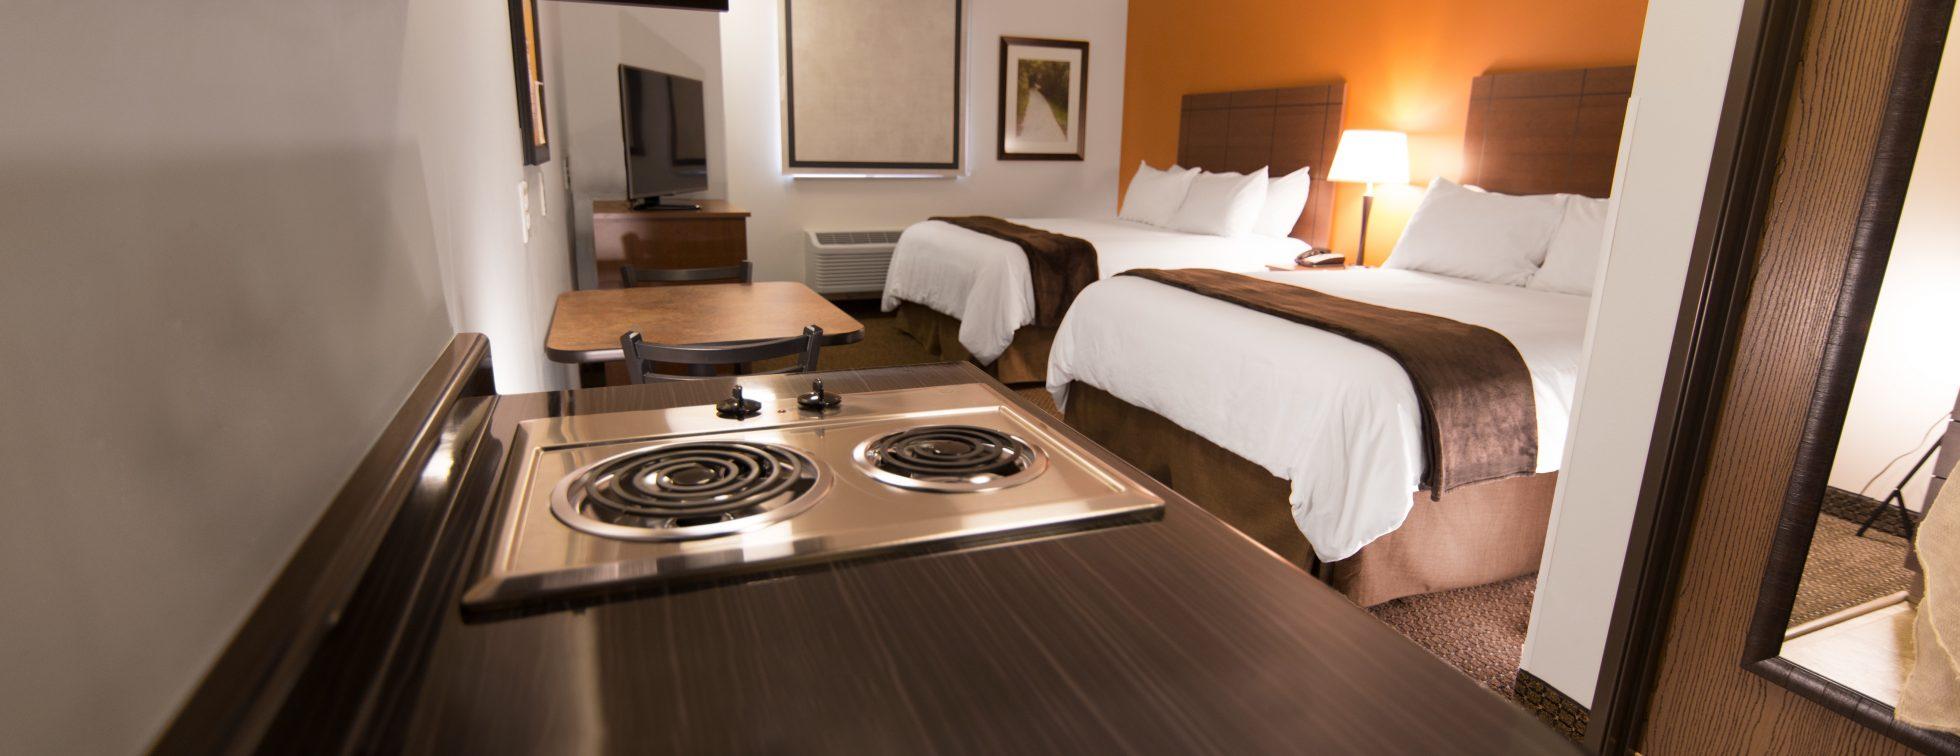 Room Reservation Request Ut